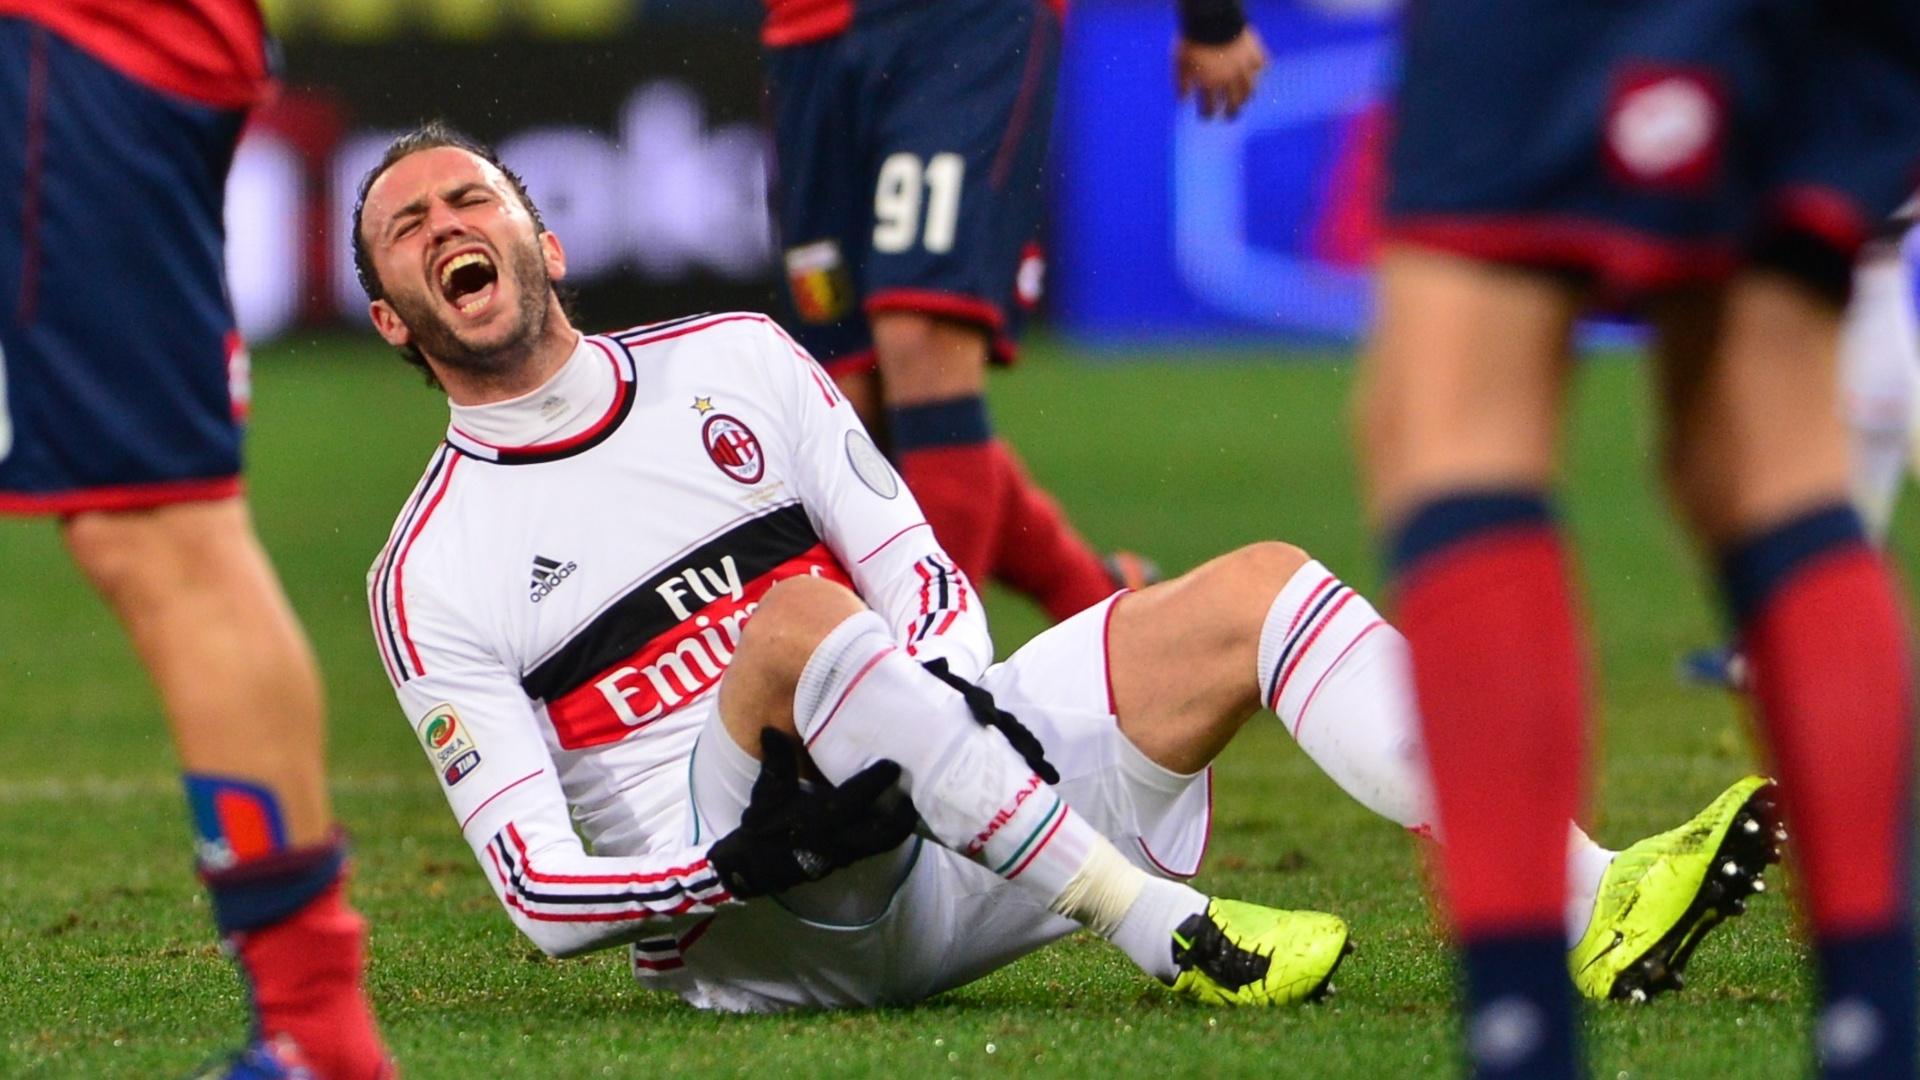 08.mar.2013 - Giampaolo Pazzini, do Milan, urra após sofrer falta e se lesionar durante a partida contra o Genoa, pelo Campeonato Italiano